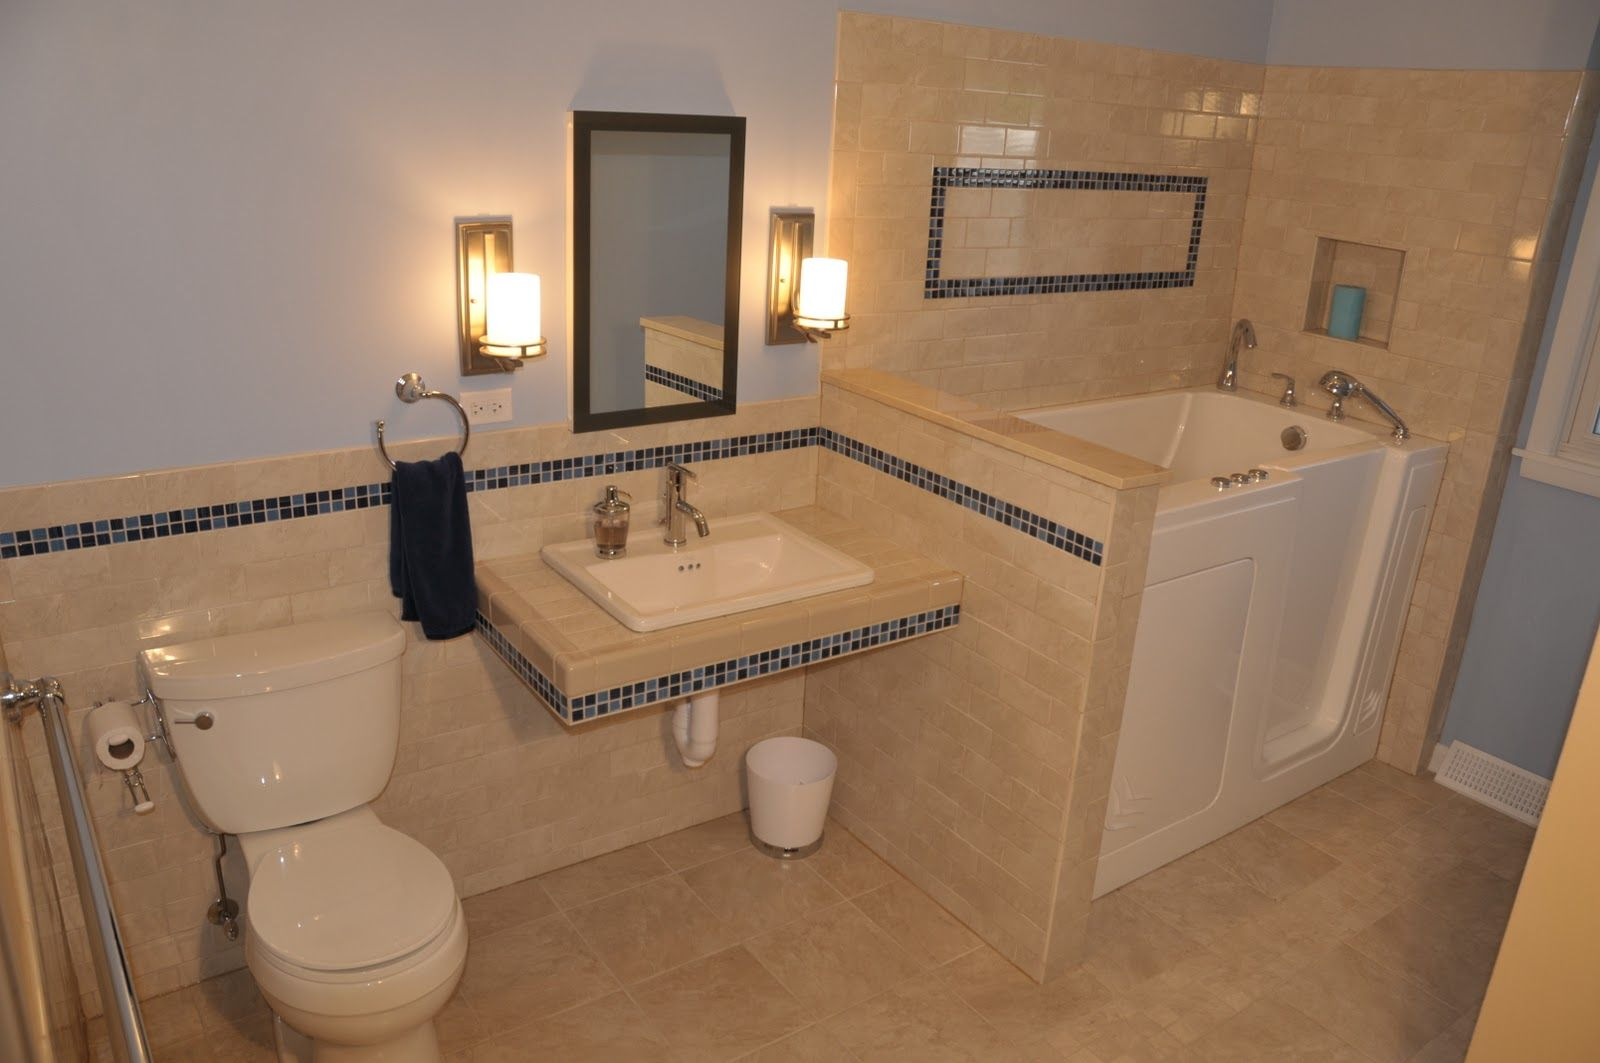 Wheelchair Accessible Bathrooms | Gallery of Accessible Bathrooms « ADA Pros